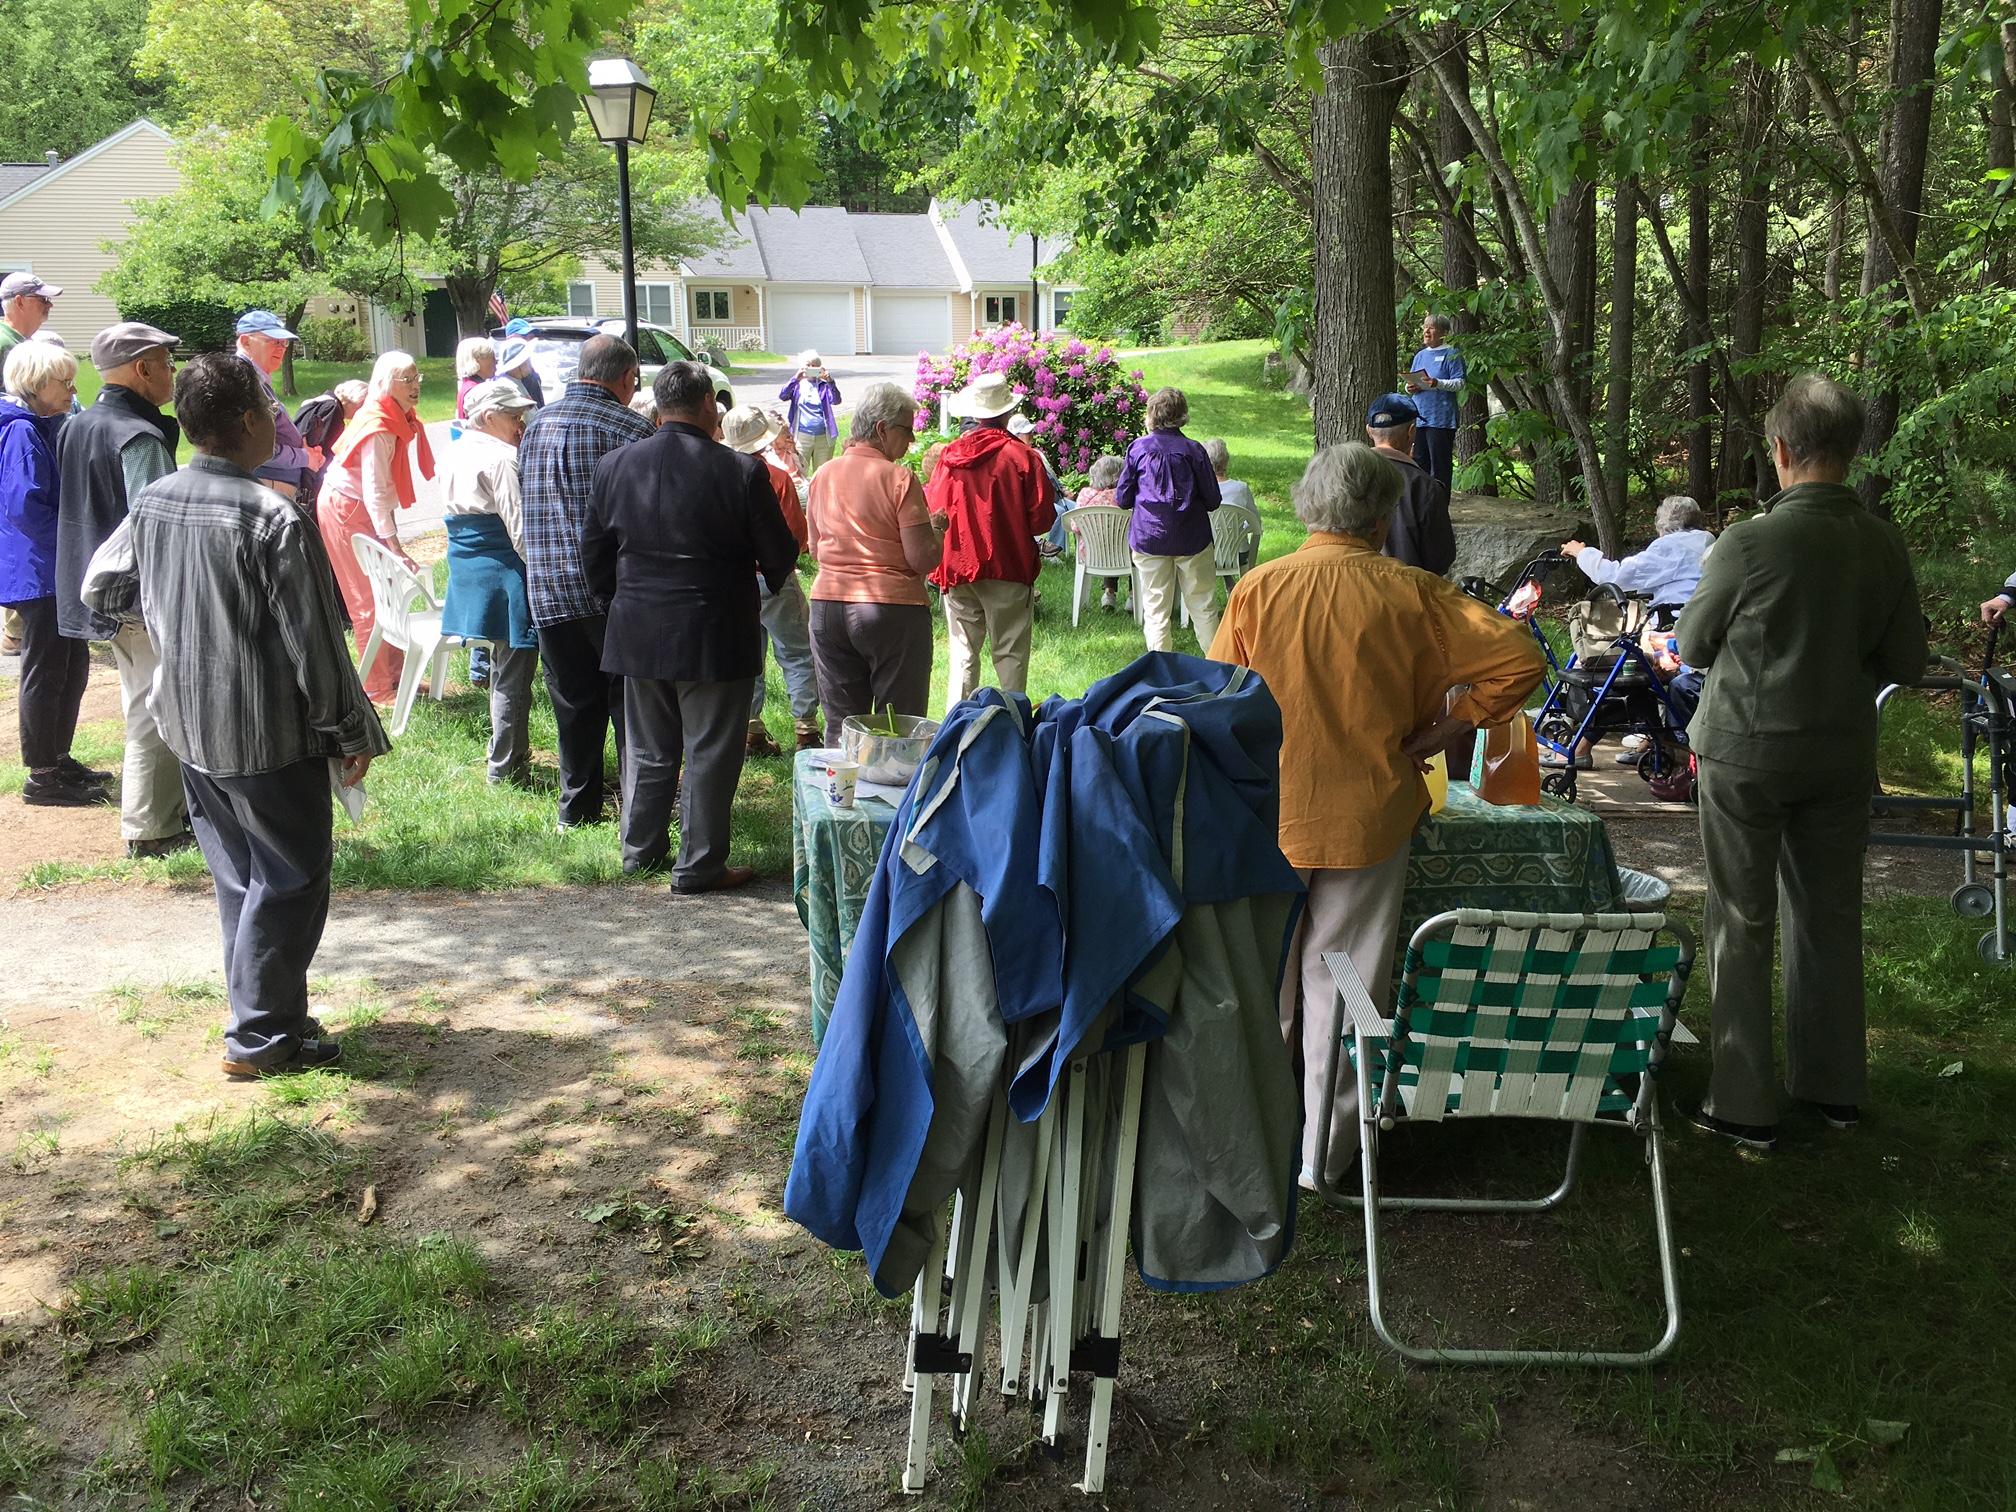 Trail Dedication Ceremony At The Lathrop Community, Northampton, MA